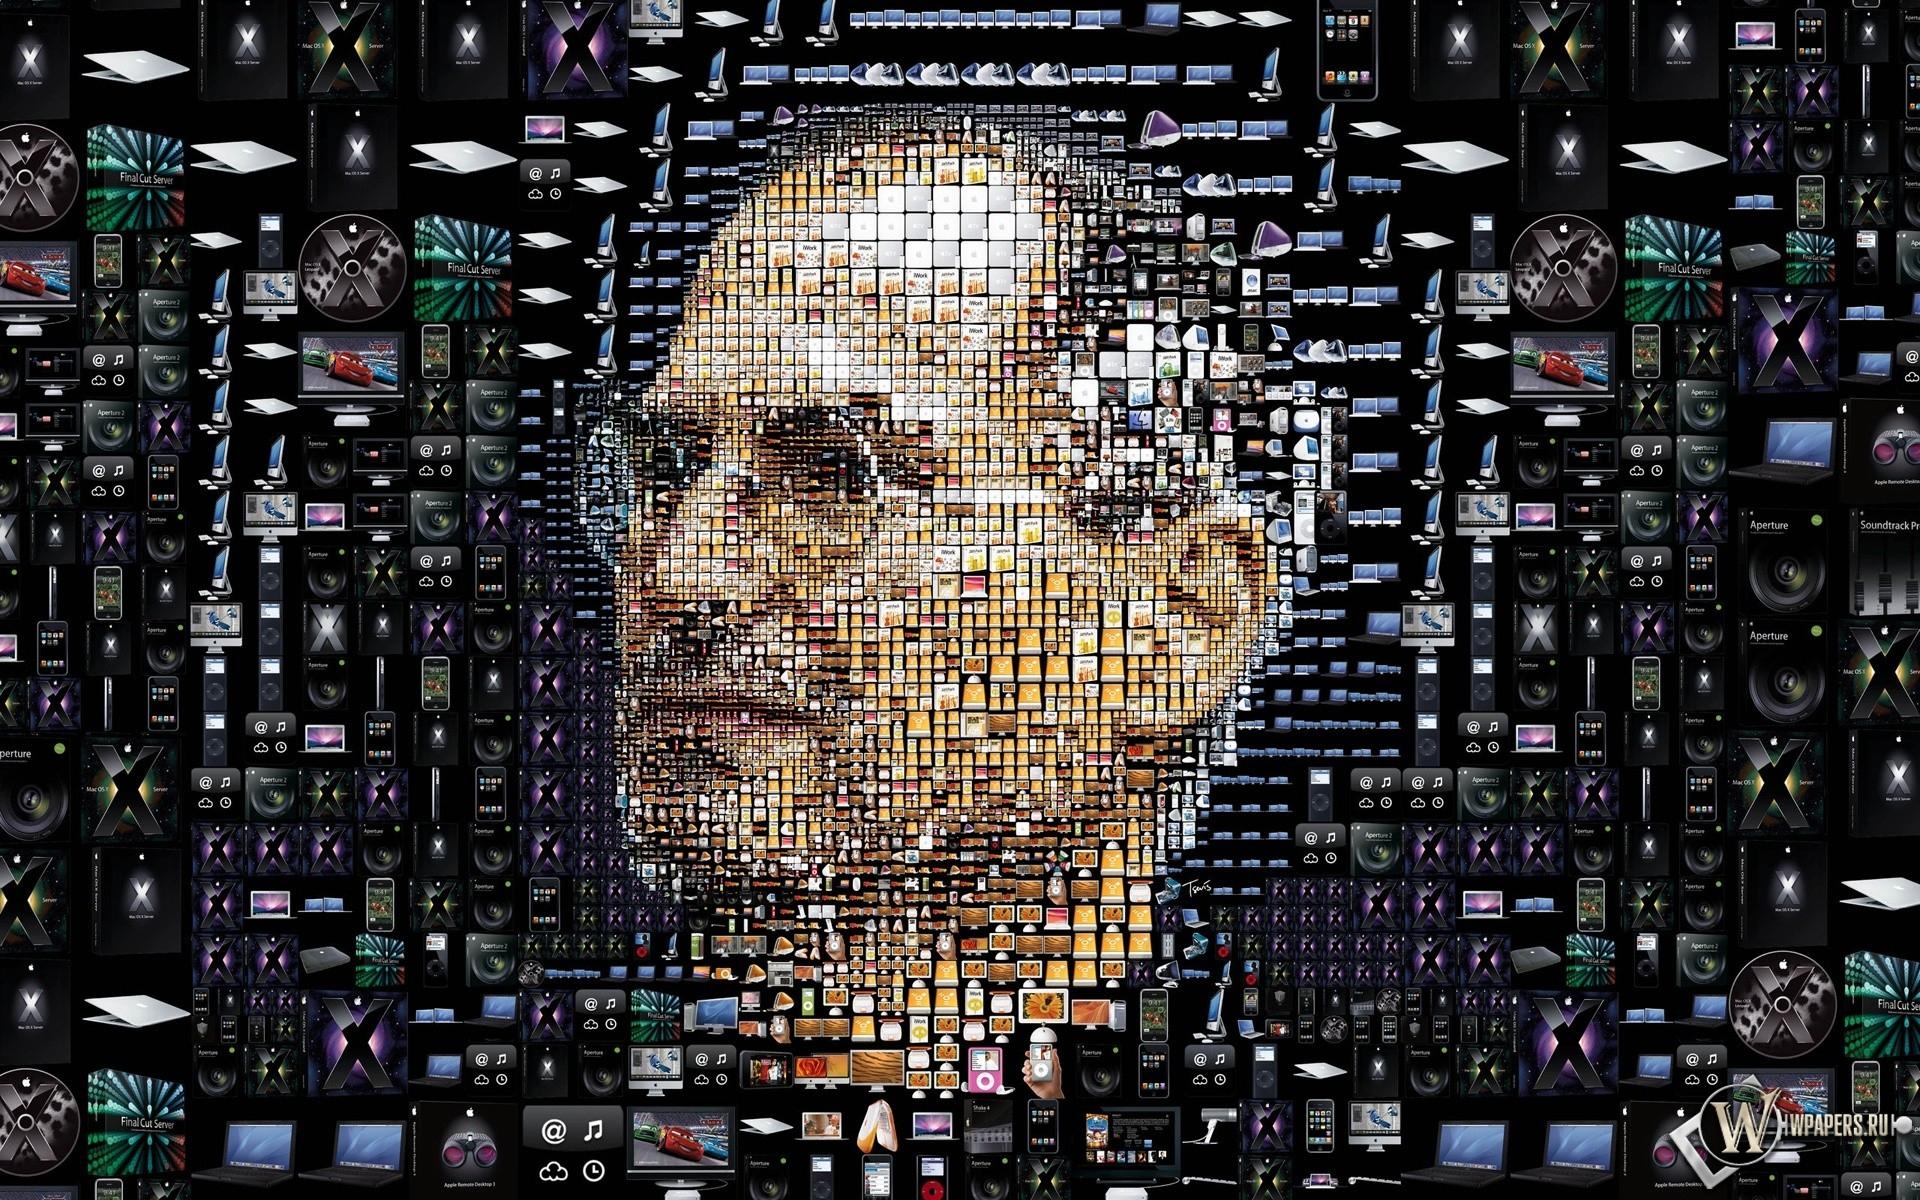 Steve Jobs 1920x1200